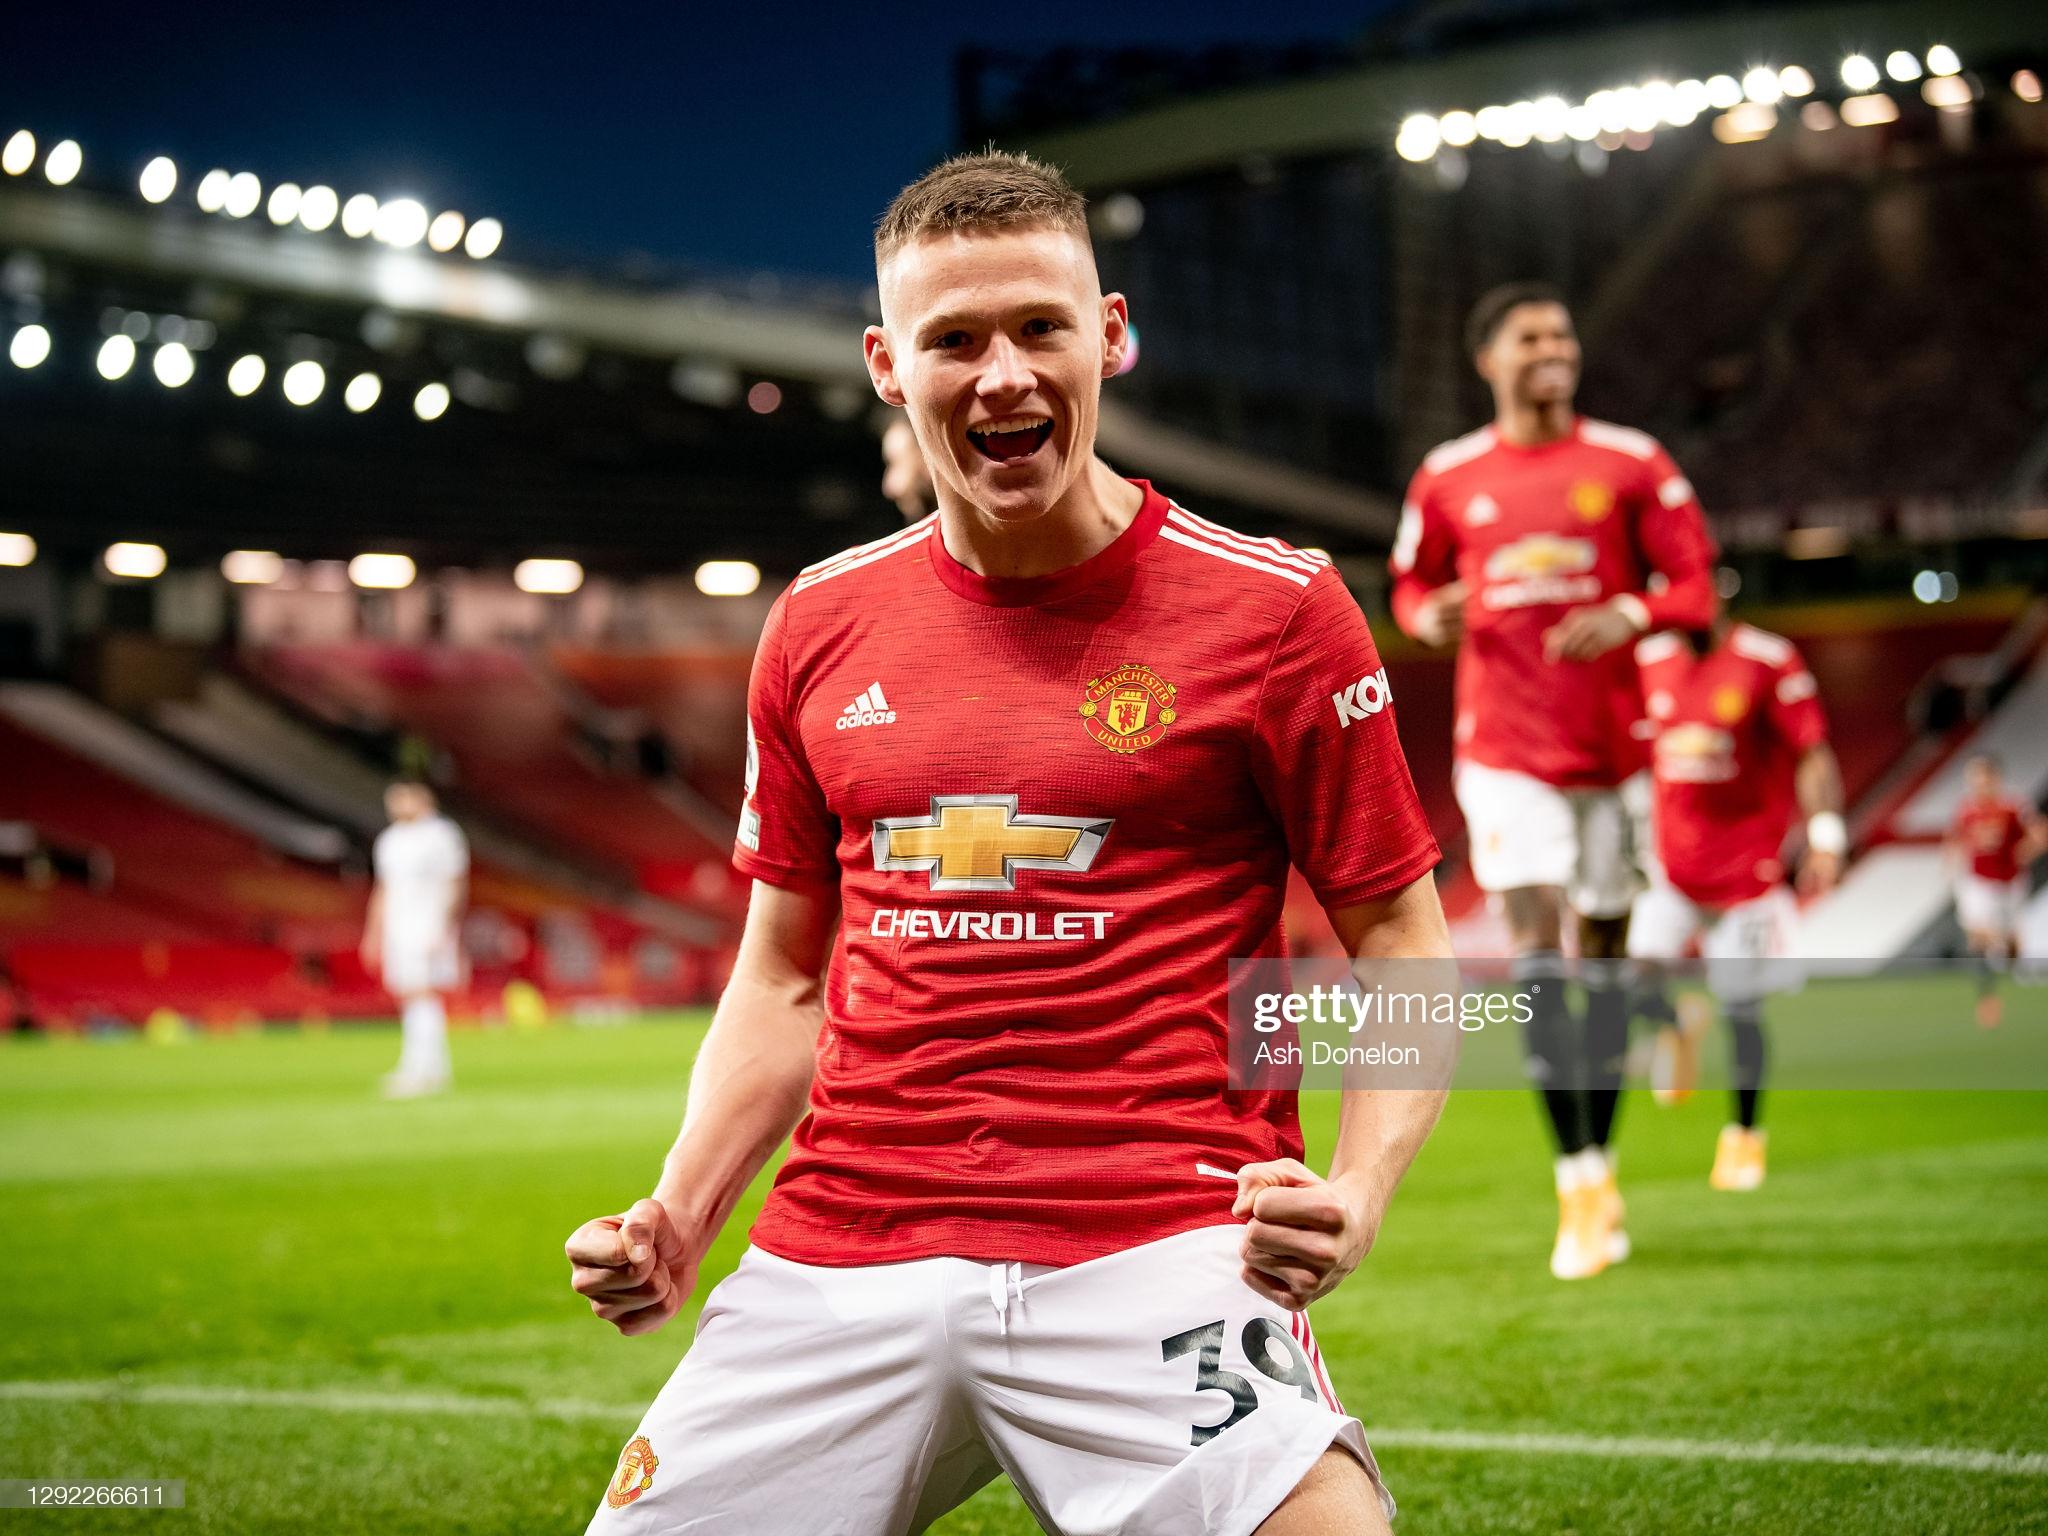 Manchester United: Scott McTominay